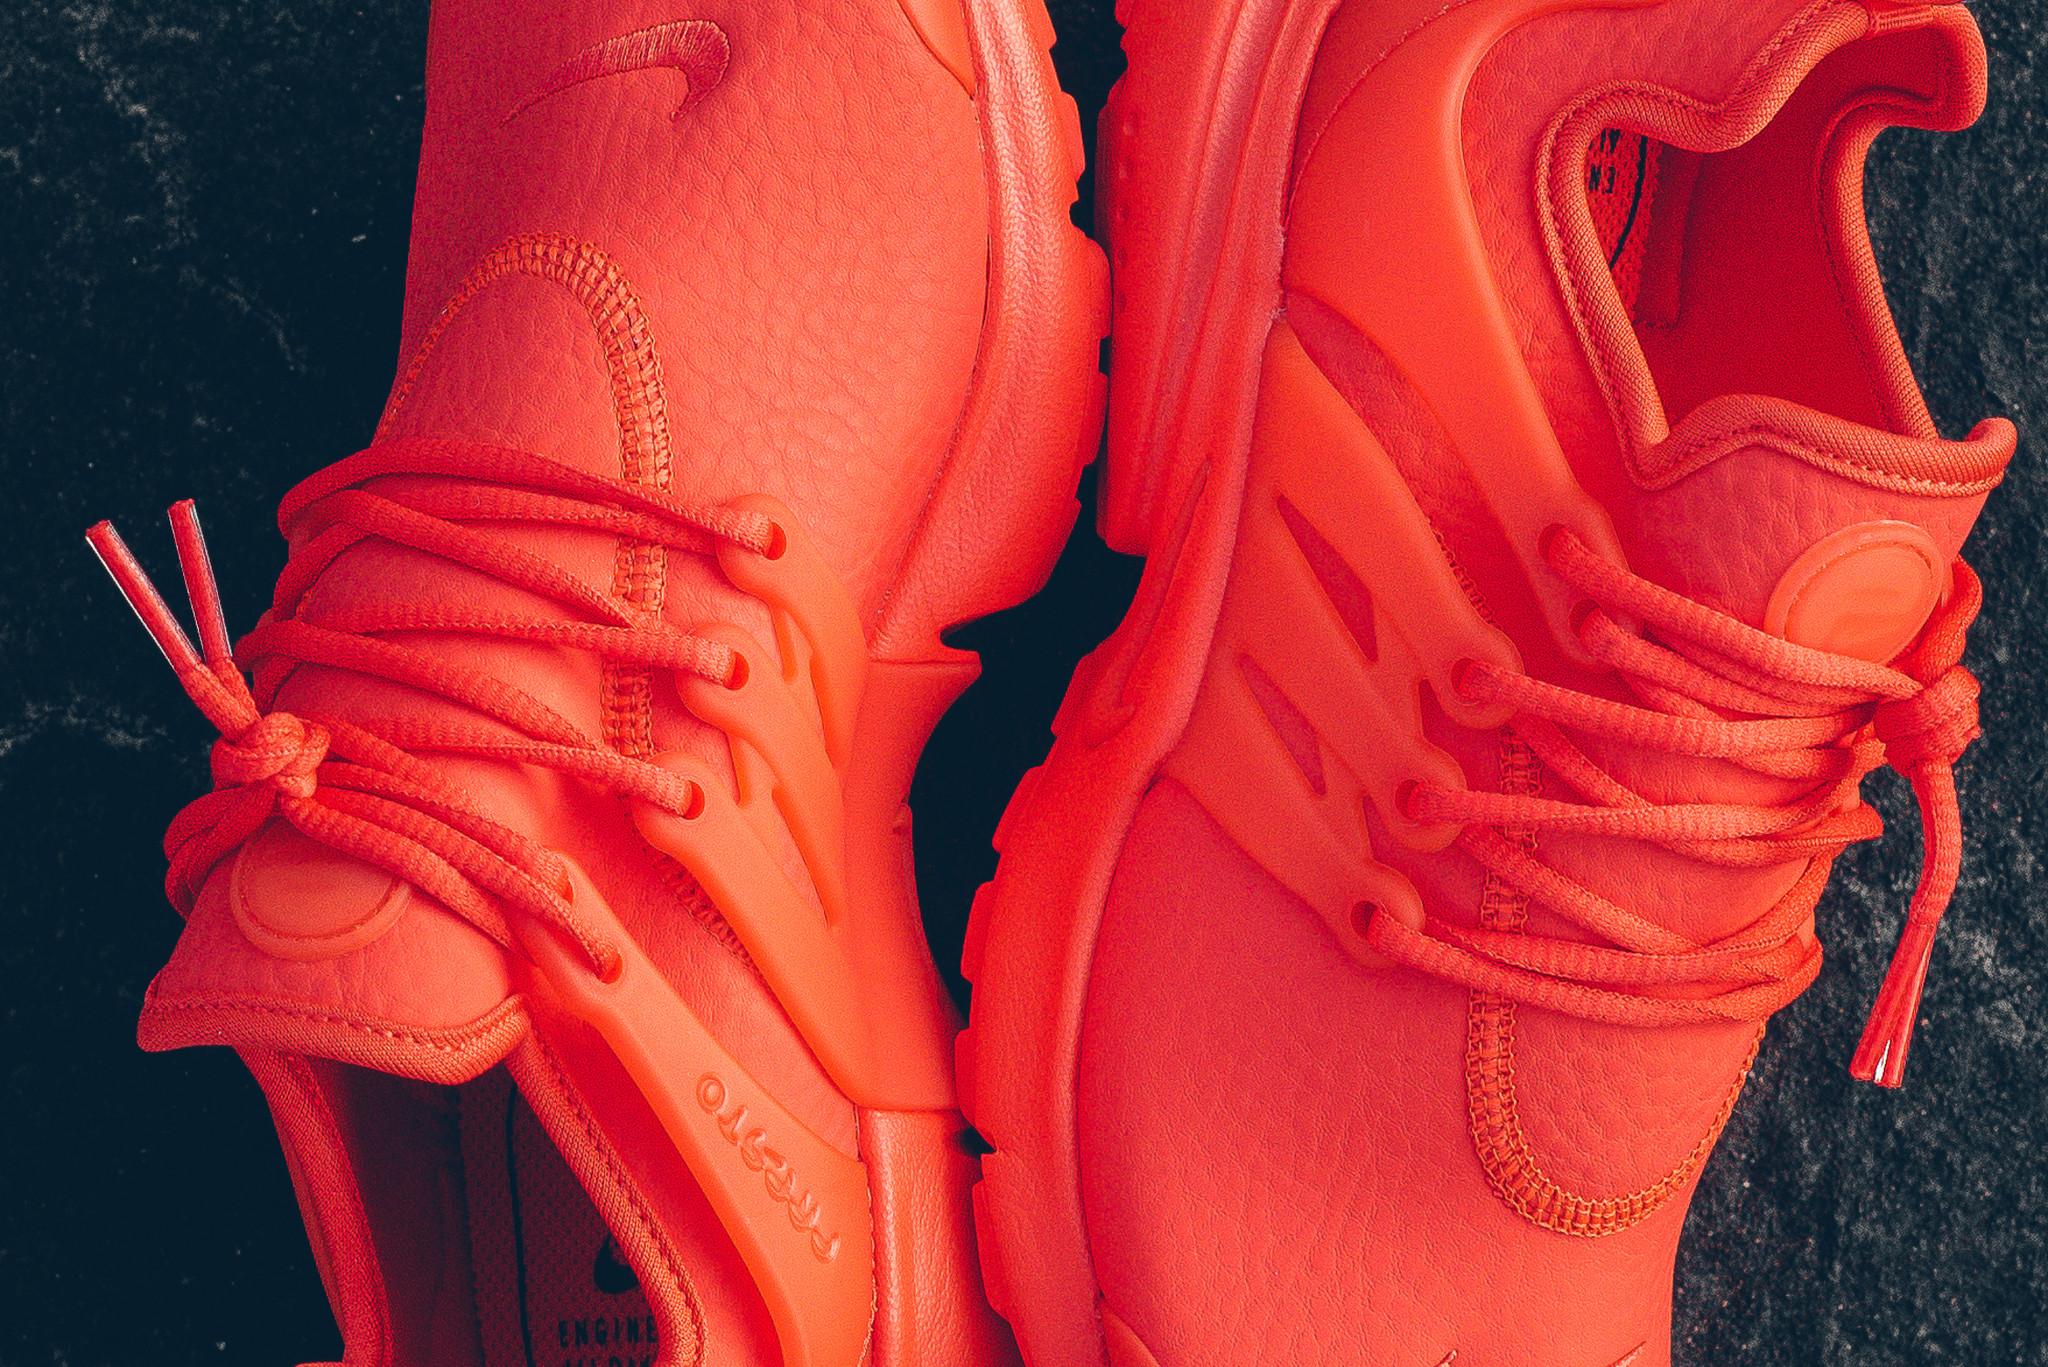 WMNS_Nike_Air_Presto_PRM_Max_Orange_Sneaker_Politics_HypeBeast_7